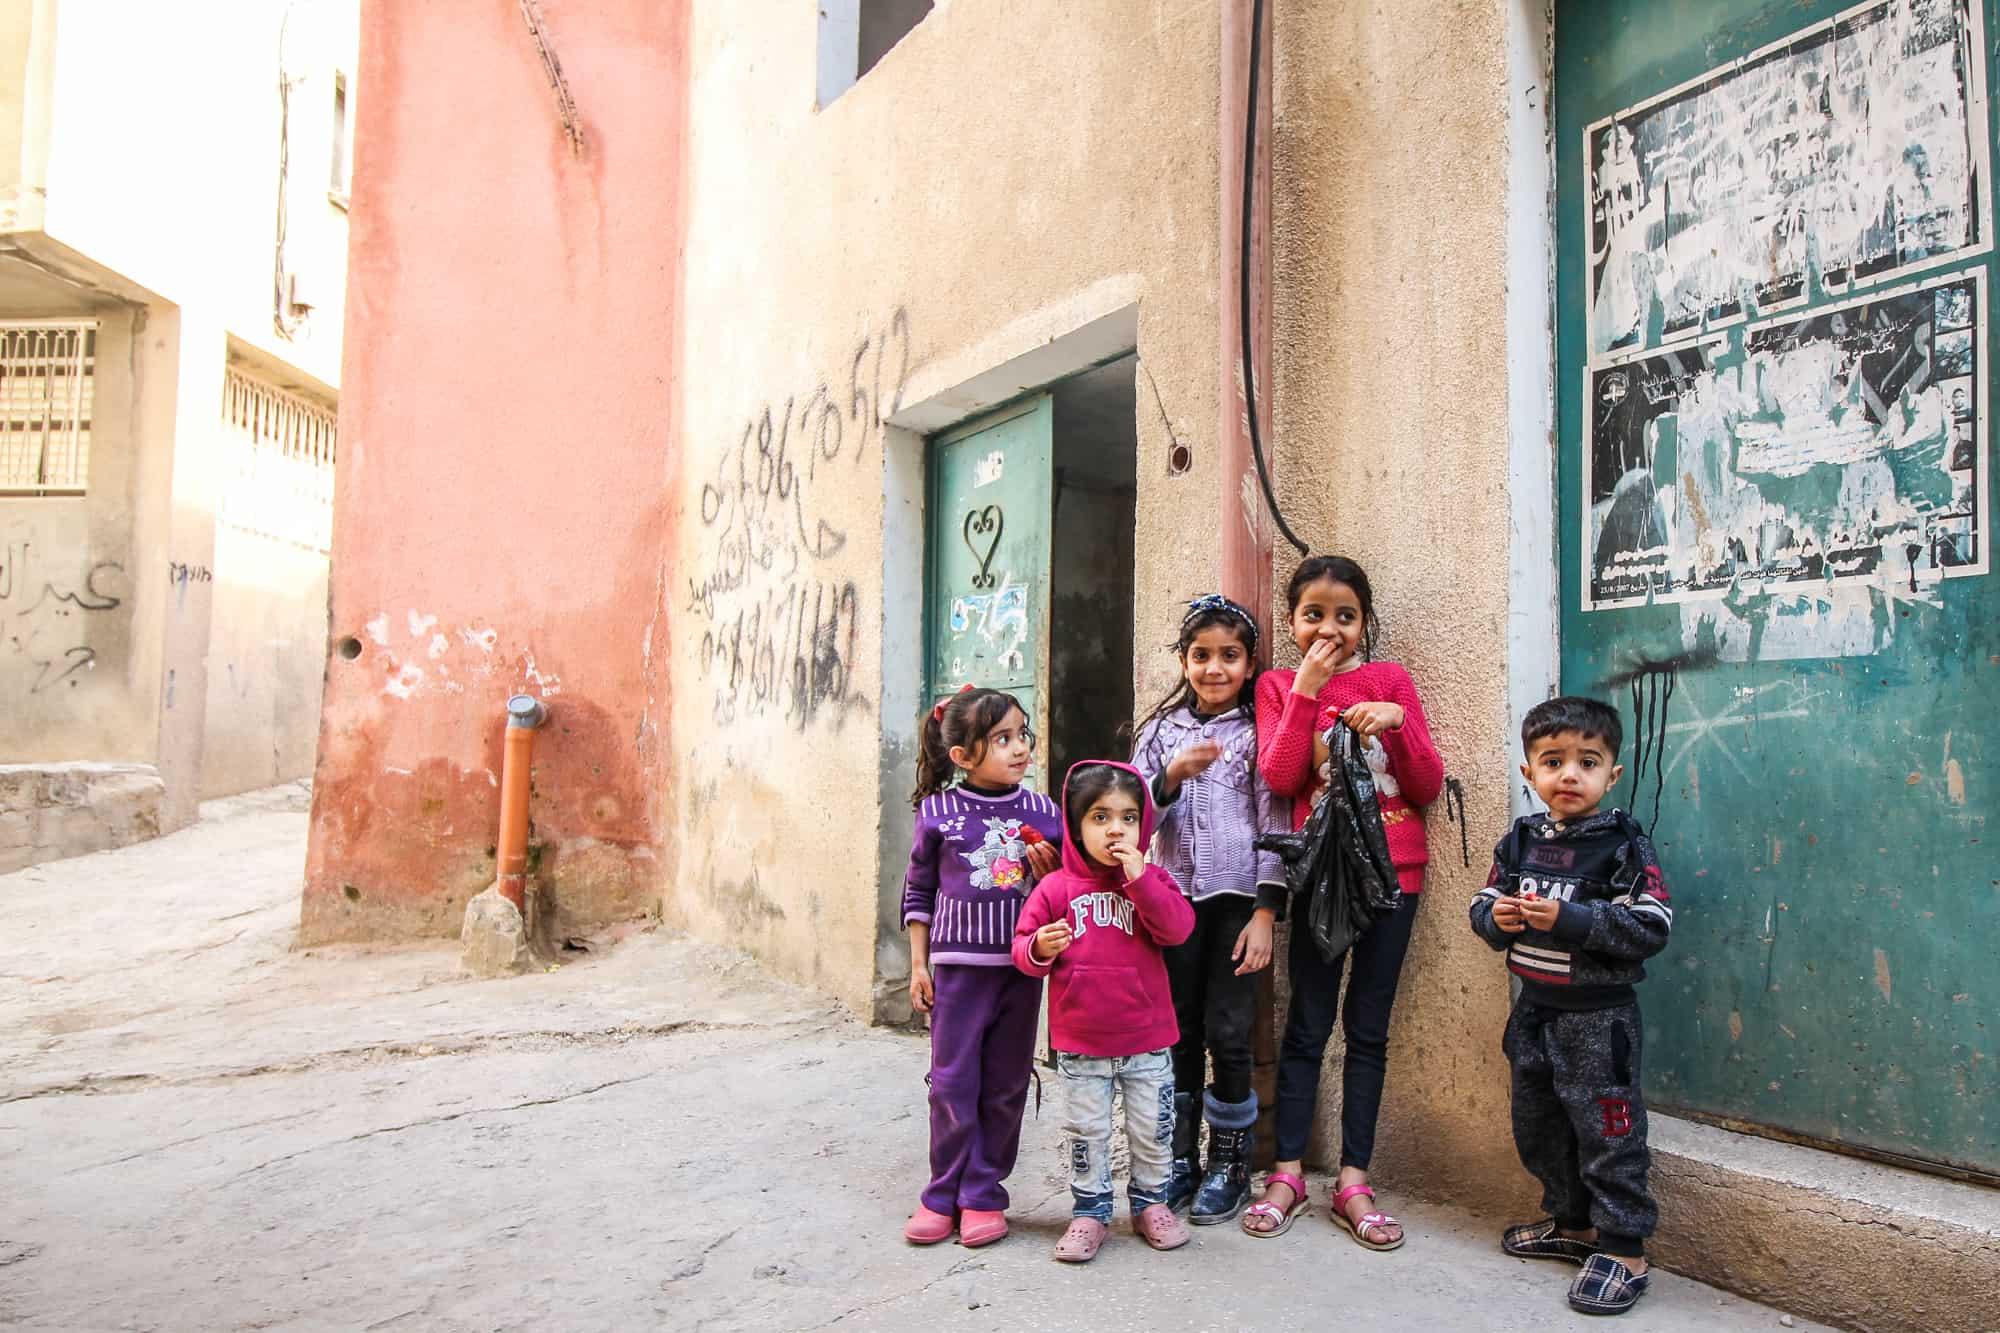 Nablus und Jenin Tour Stopp 6: Flüchtlingslager in der Nähe von Jenin